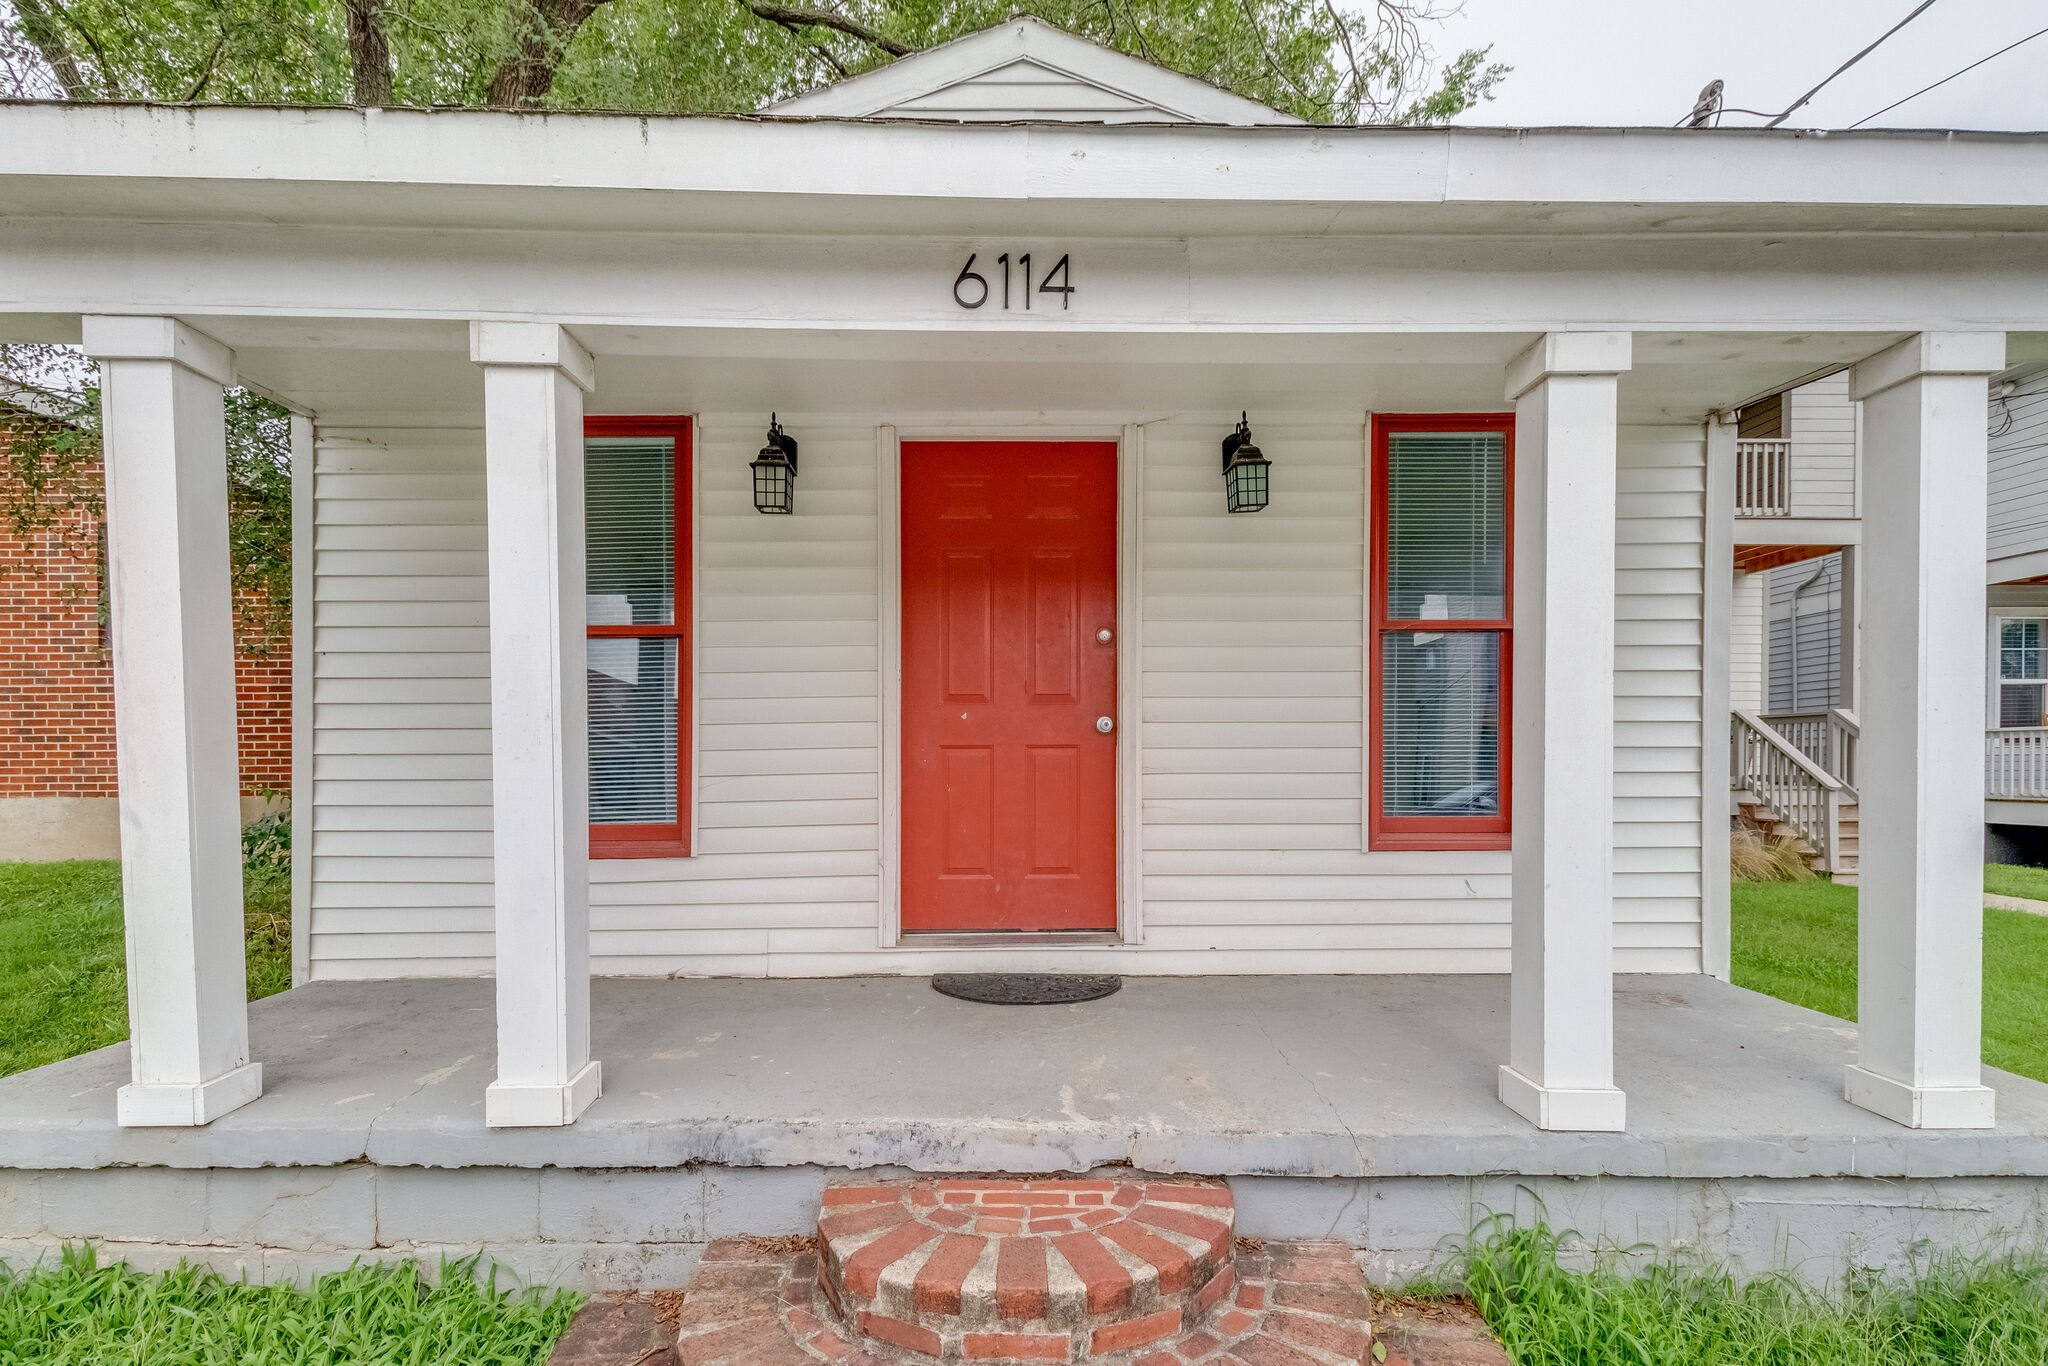 6114 New York Ave Property Photo - Nashville, TN real estate listing